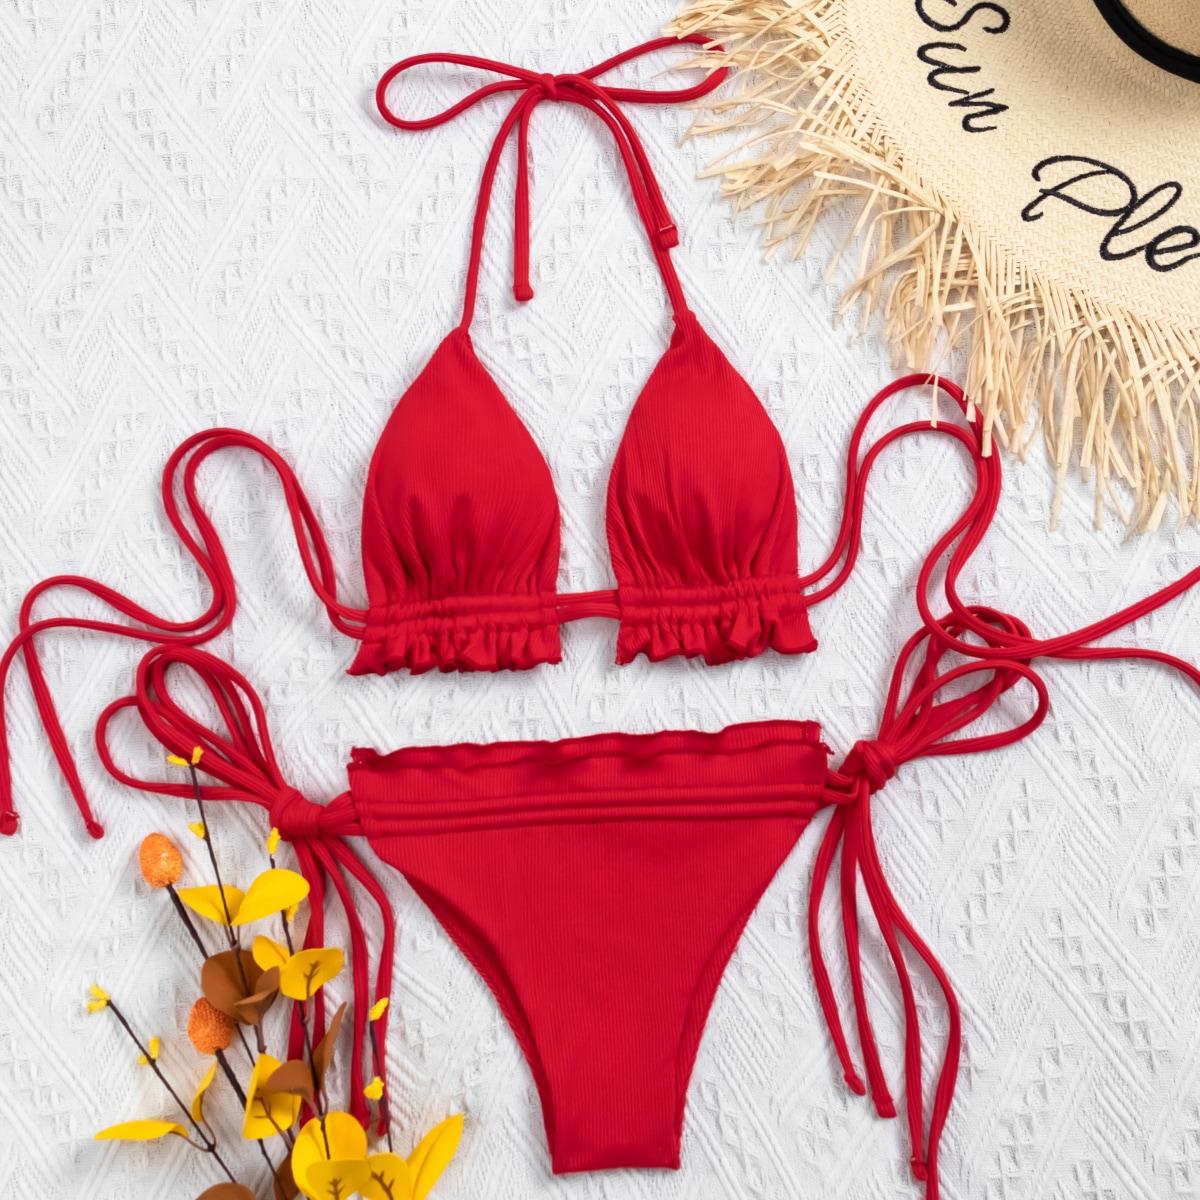 Frill Trim Triangle Thong Bikini Swimsuit